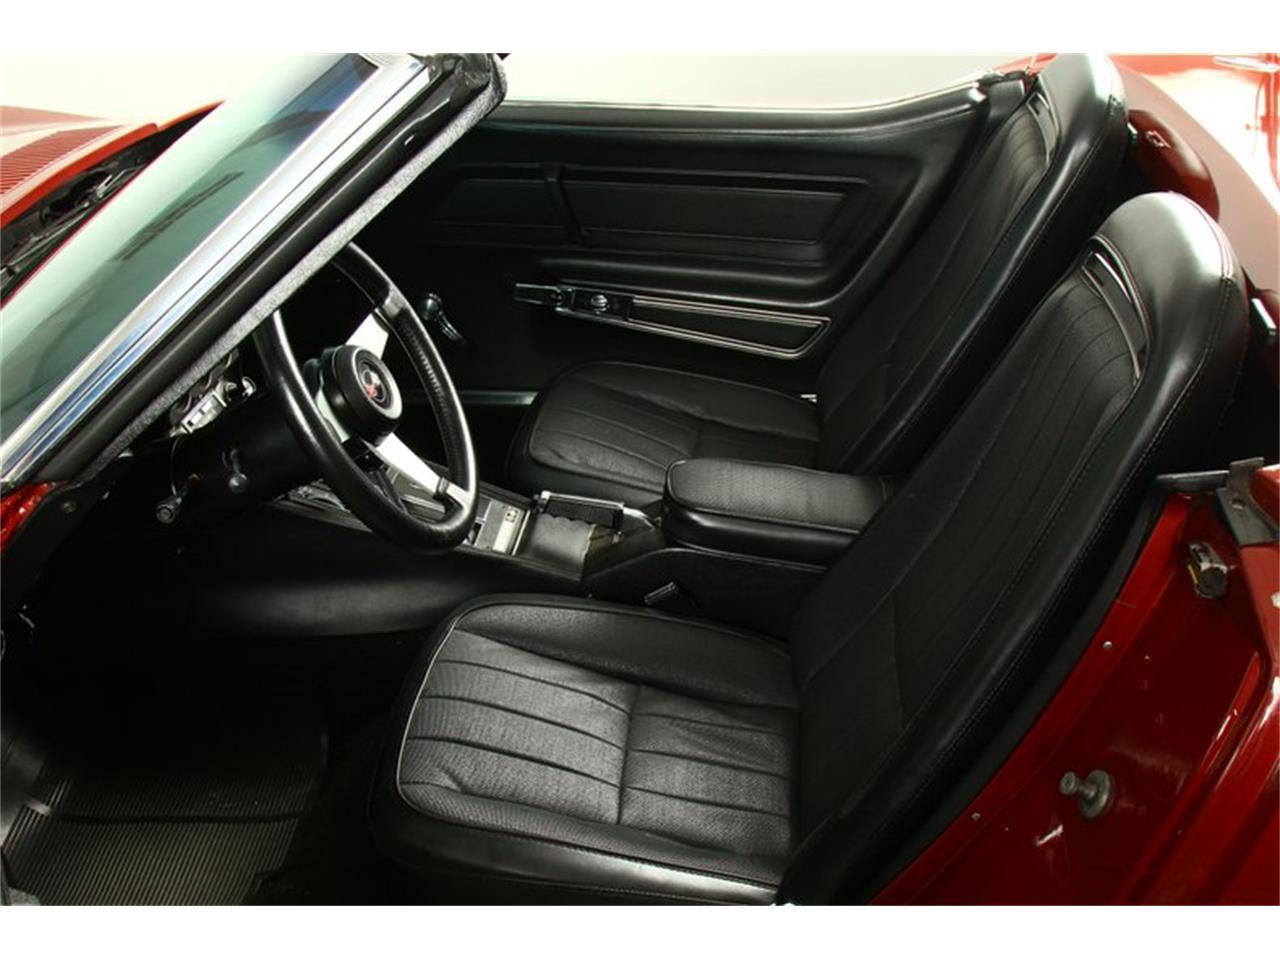 1975 Chevrolet Corvette (CC-1411547) for sale in Elyria, Ohio